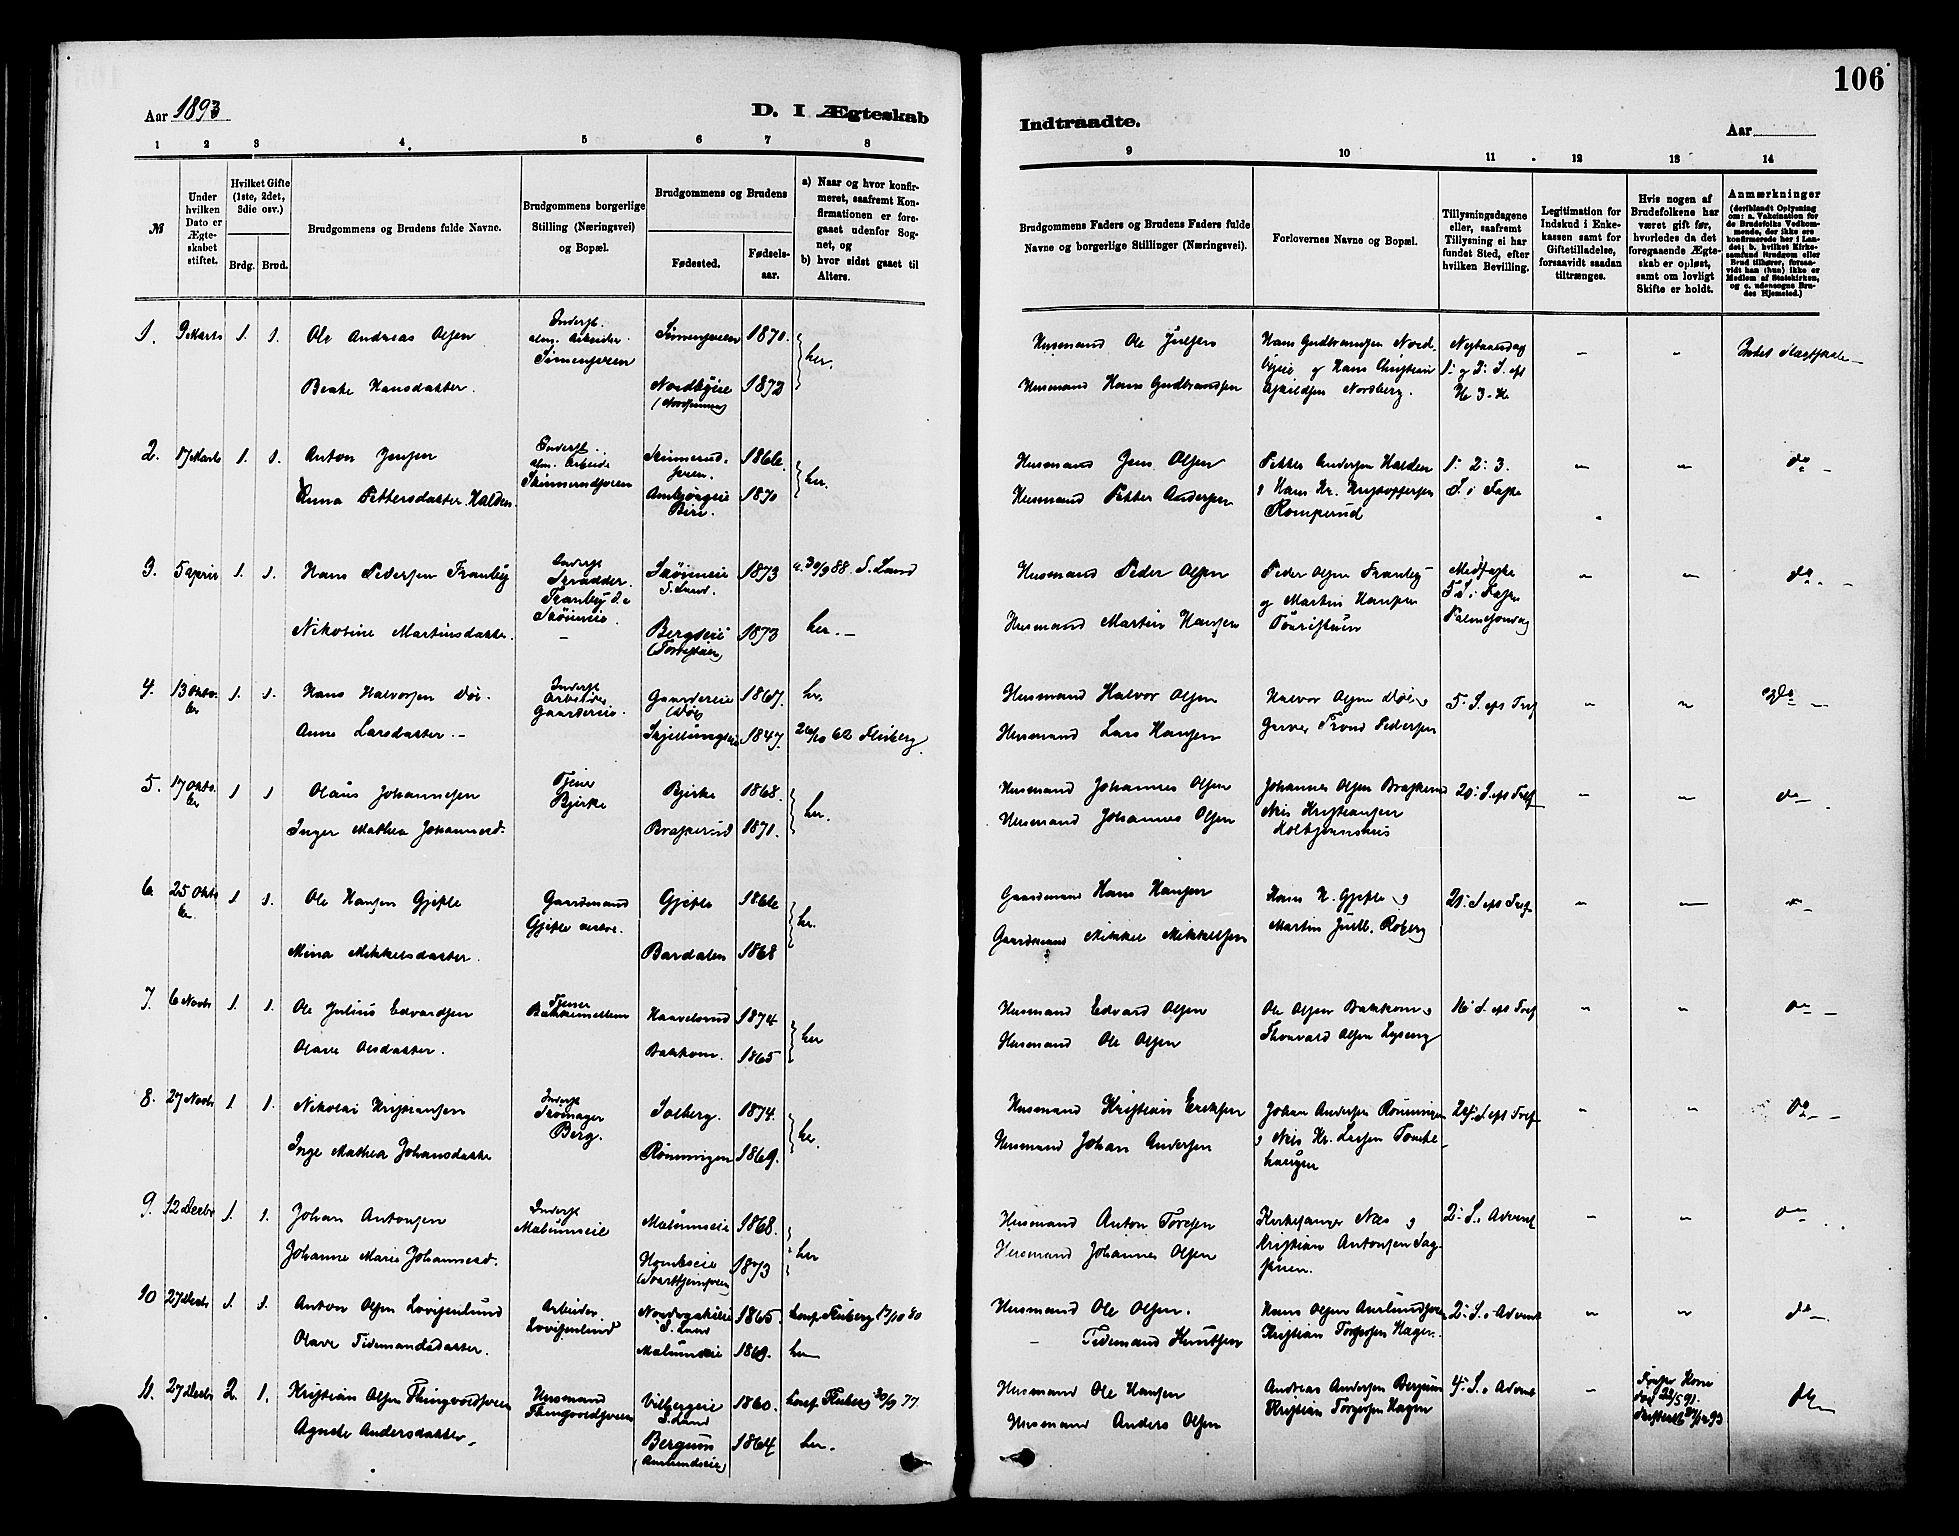 SAH, Nordre Land prestekontor, Ministerialbok nr. 3, 1882-1896, s. 106